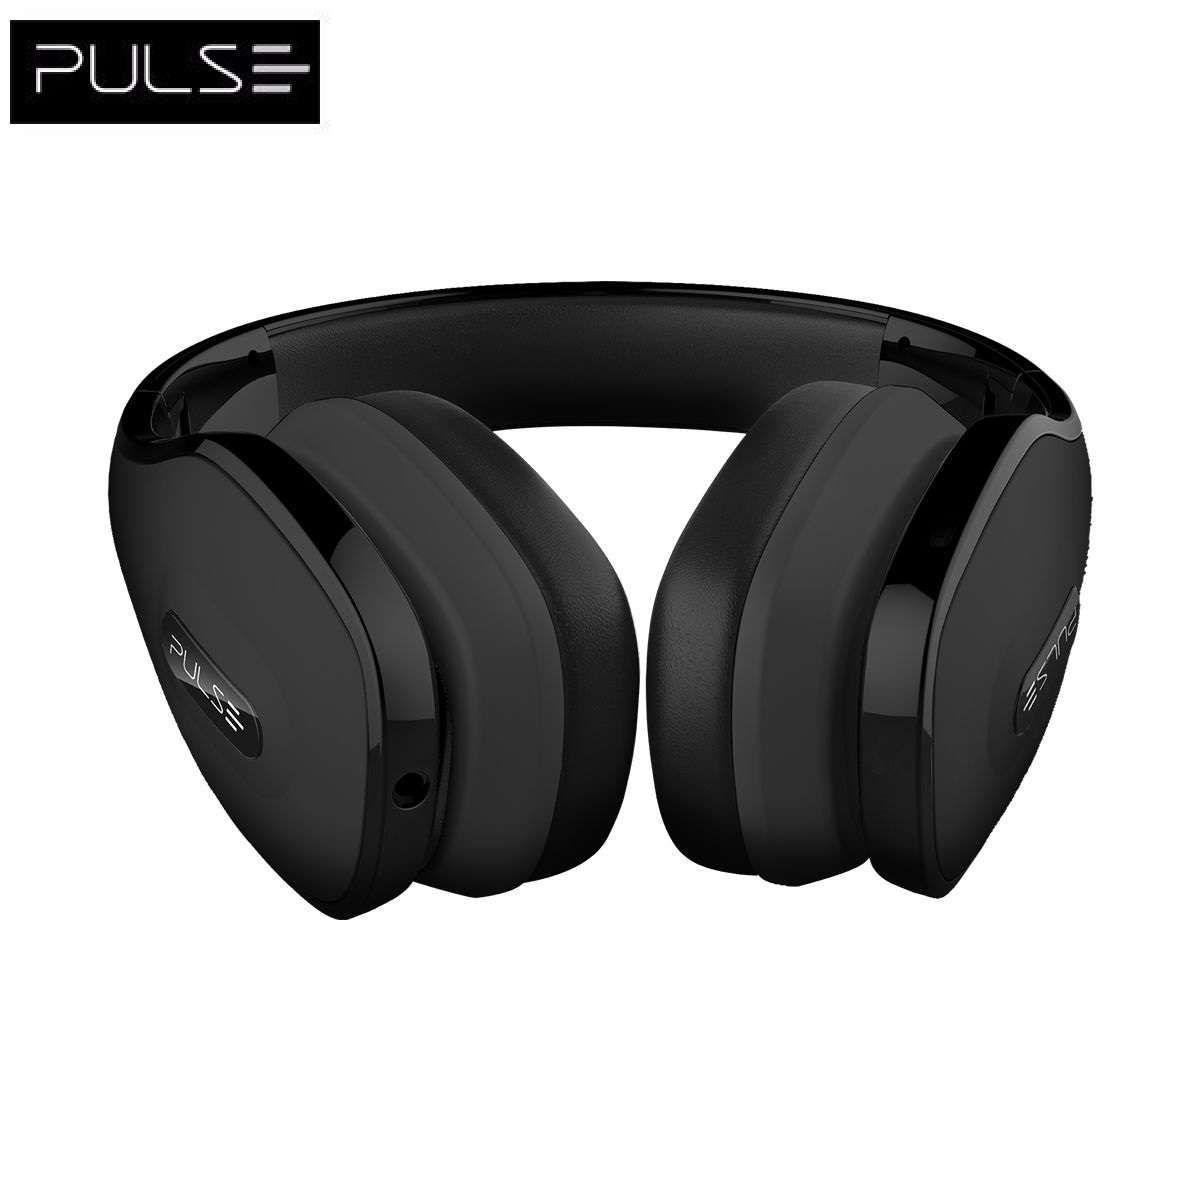 Headphone Multilaser com Microfone Pulse Over Ear Hands Free PH147 Preto